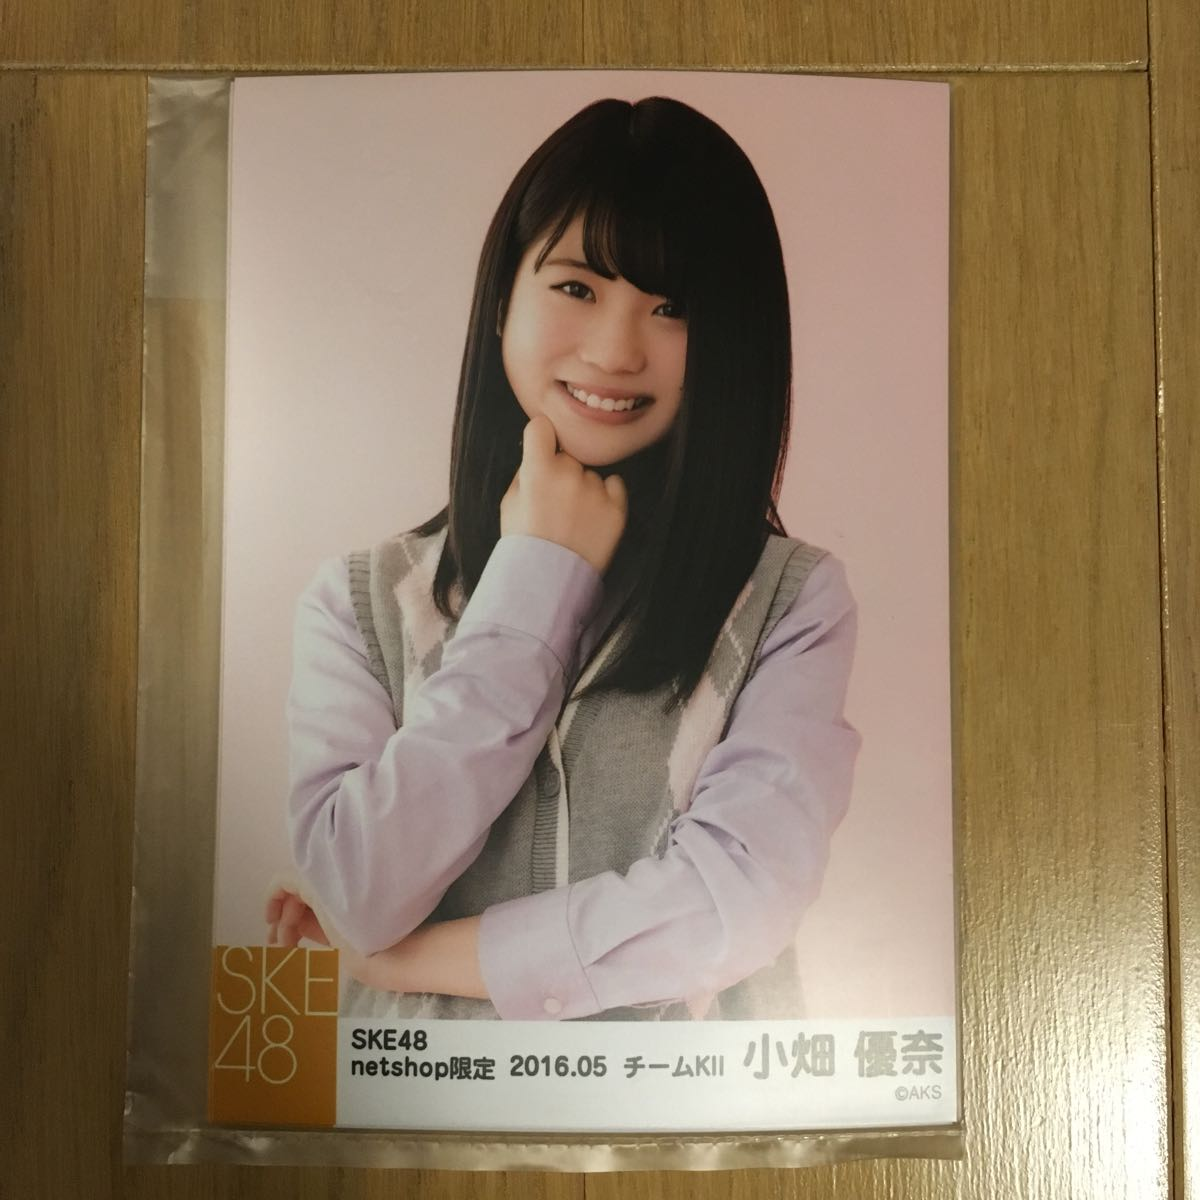 SKE48 小畑優奈 生写真 2016.5 netshop限定 5枚コンプ(未開封)